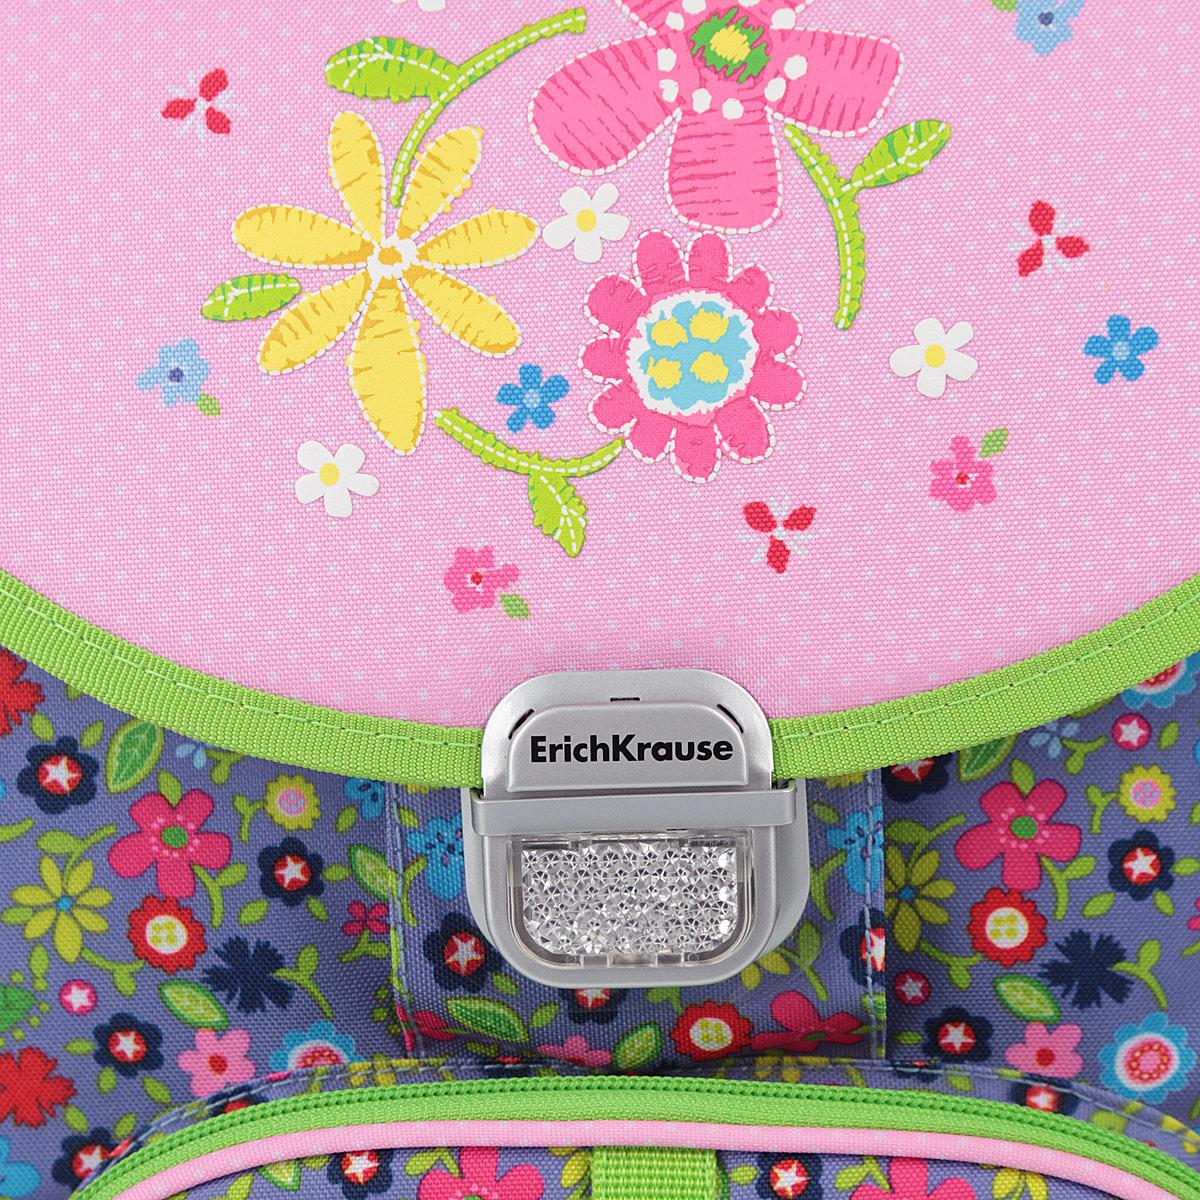 "Ранец школьный Erich Krause ""Flower Dance"", модель Generic"", цвет: серый, розовый, салатовый"